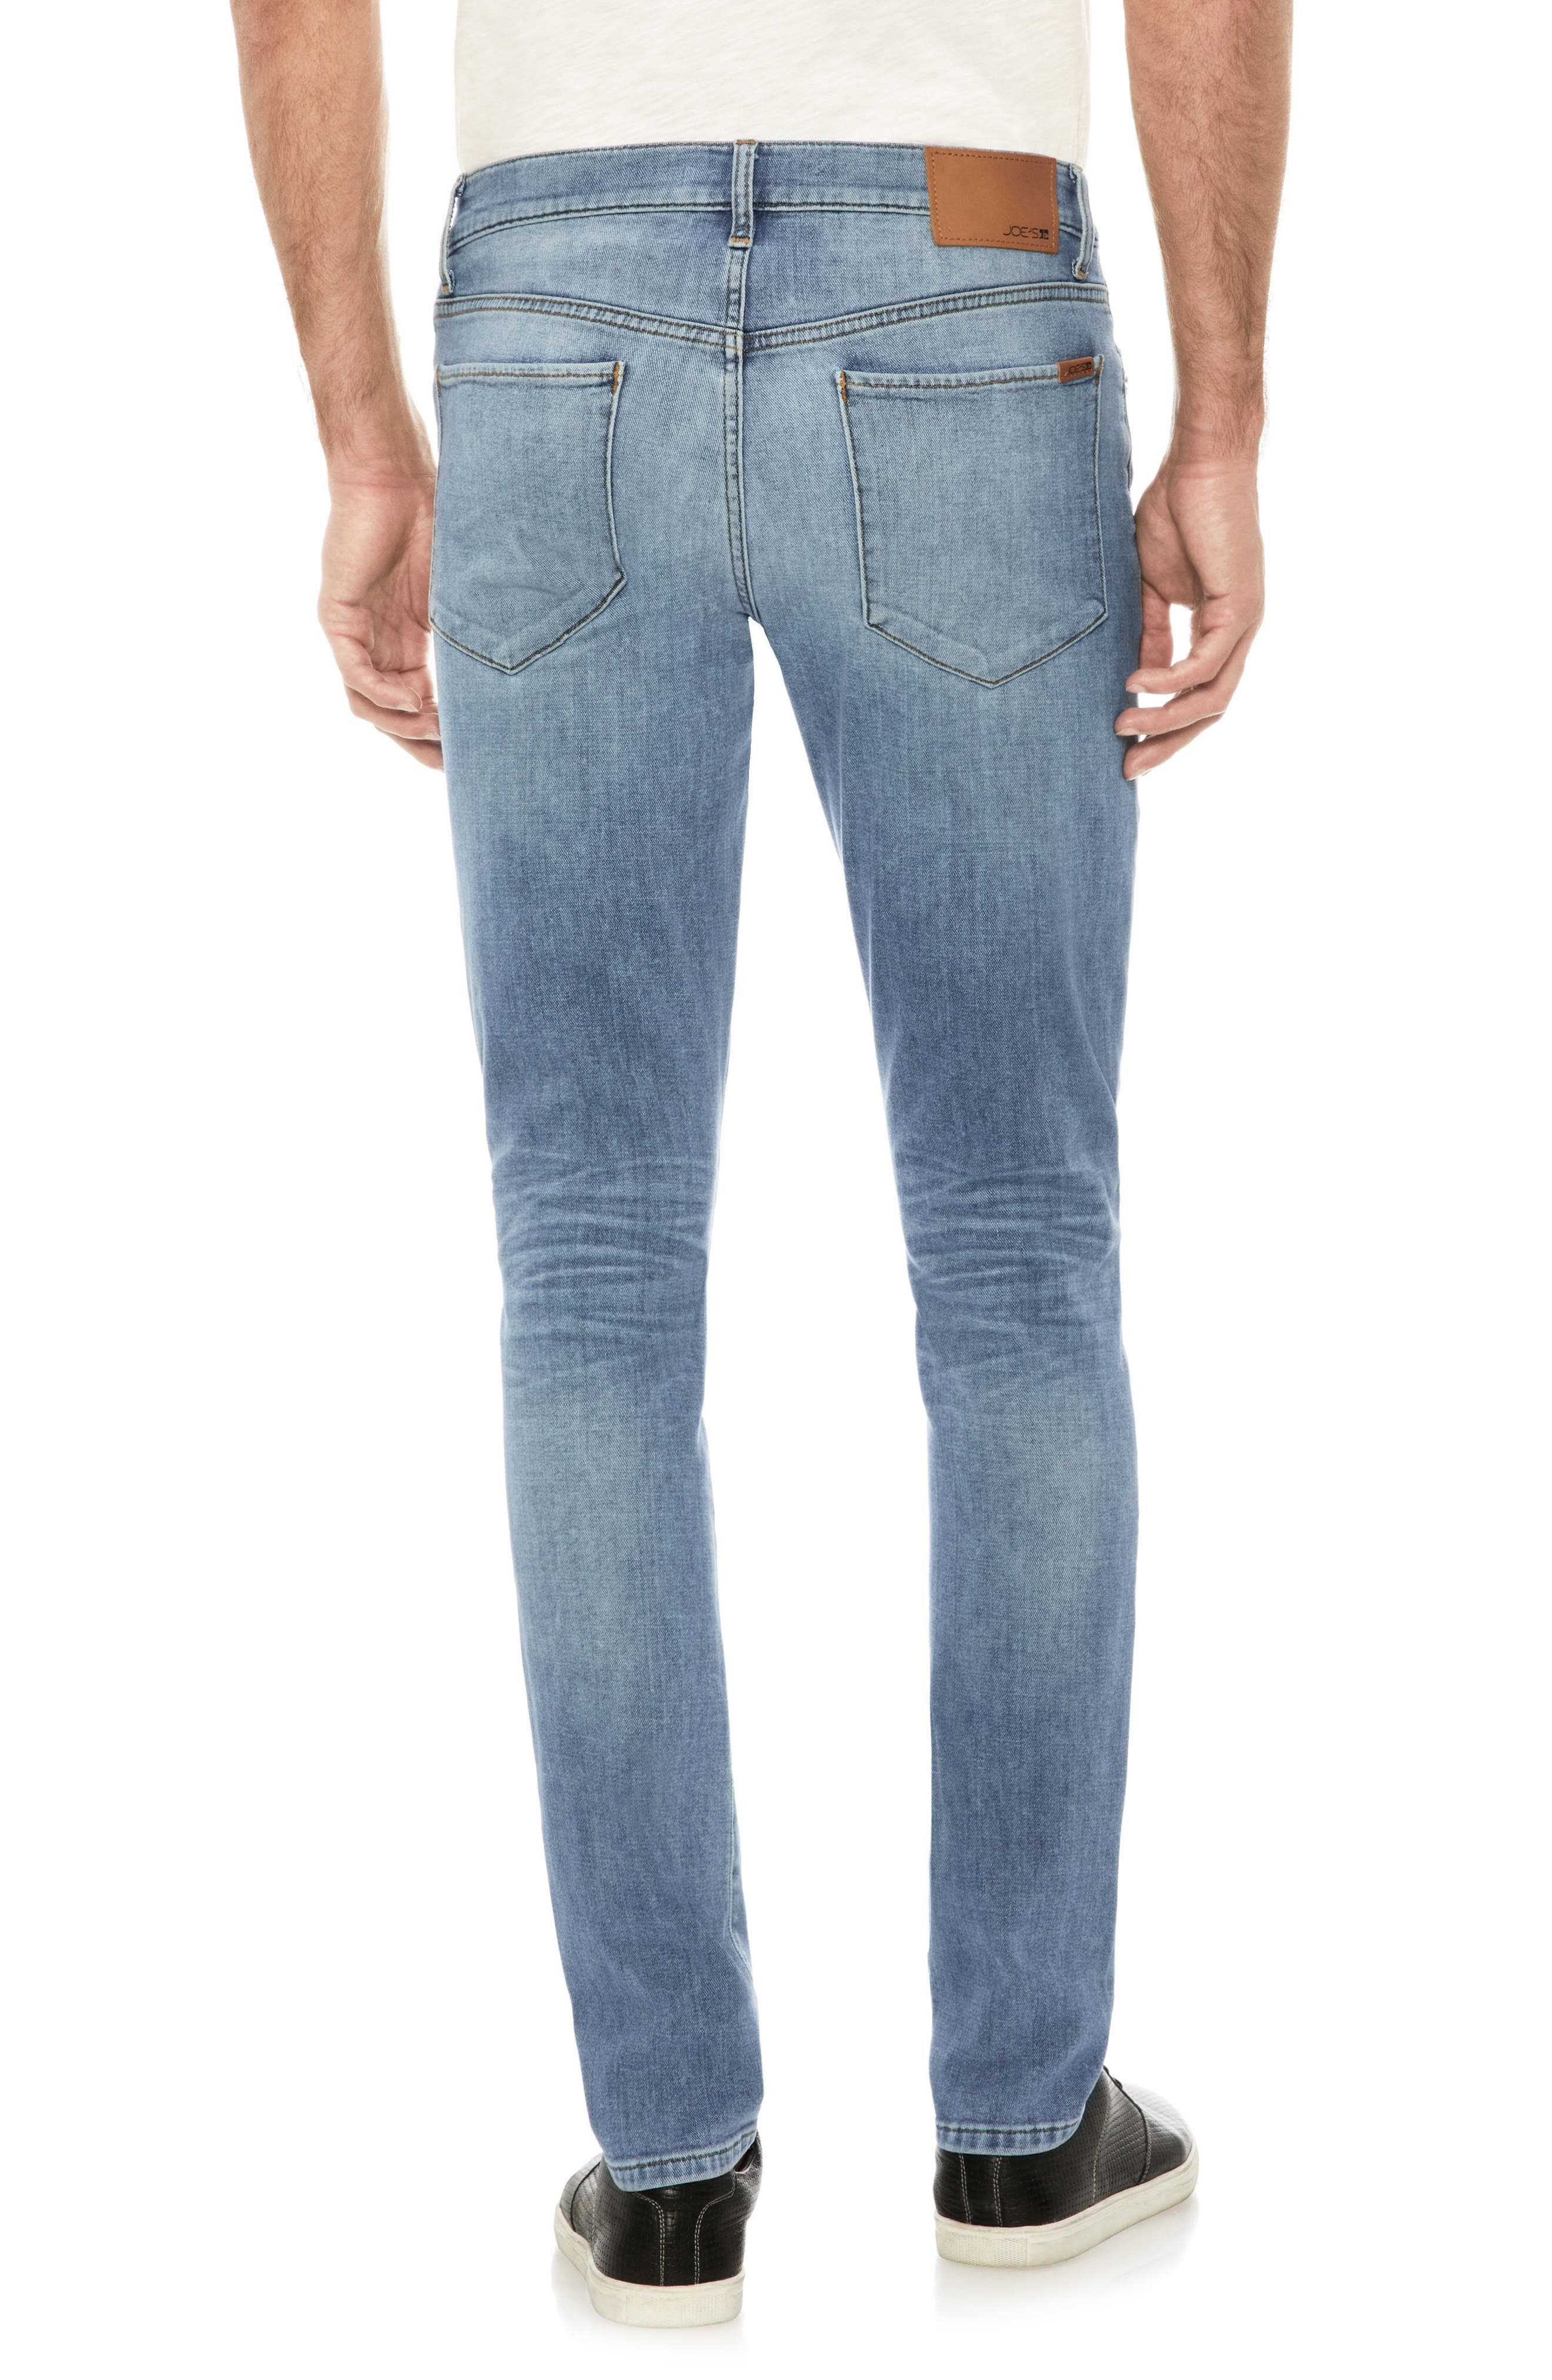 Legend Skinny Fit Jeans,                             Alternate thumbnail 2, color,                             451